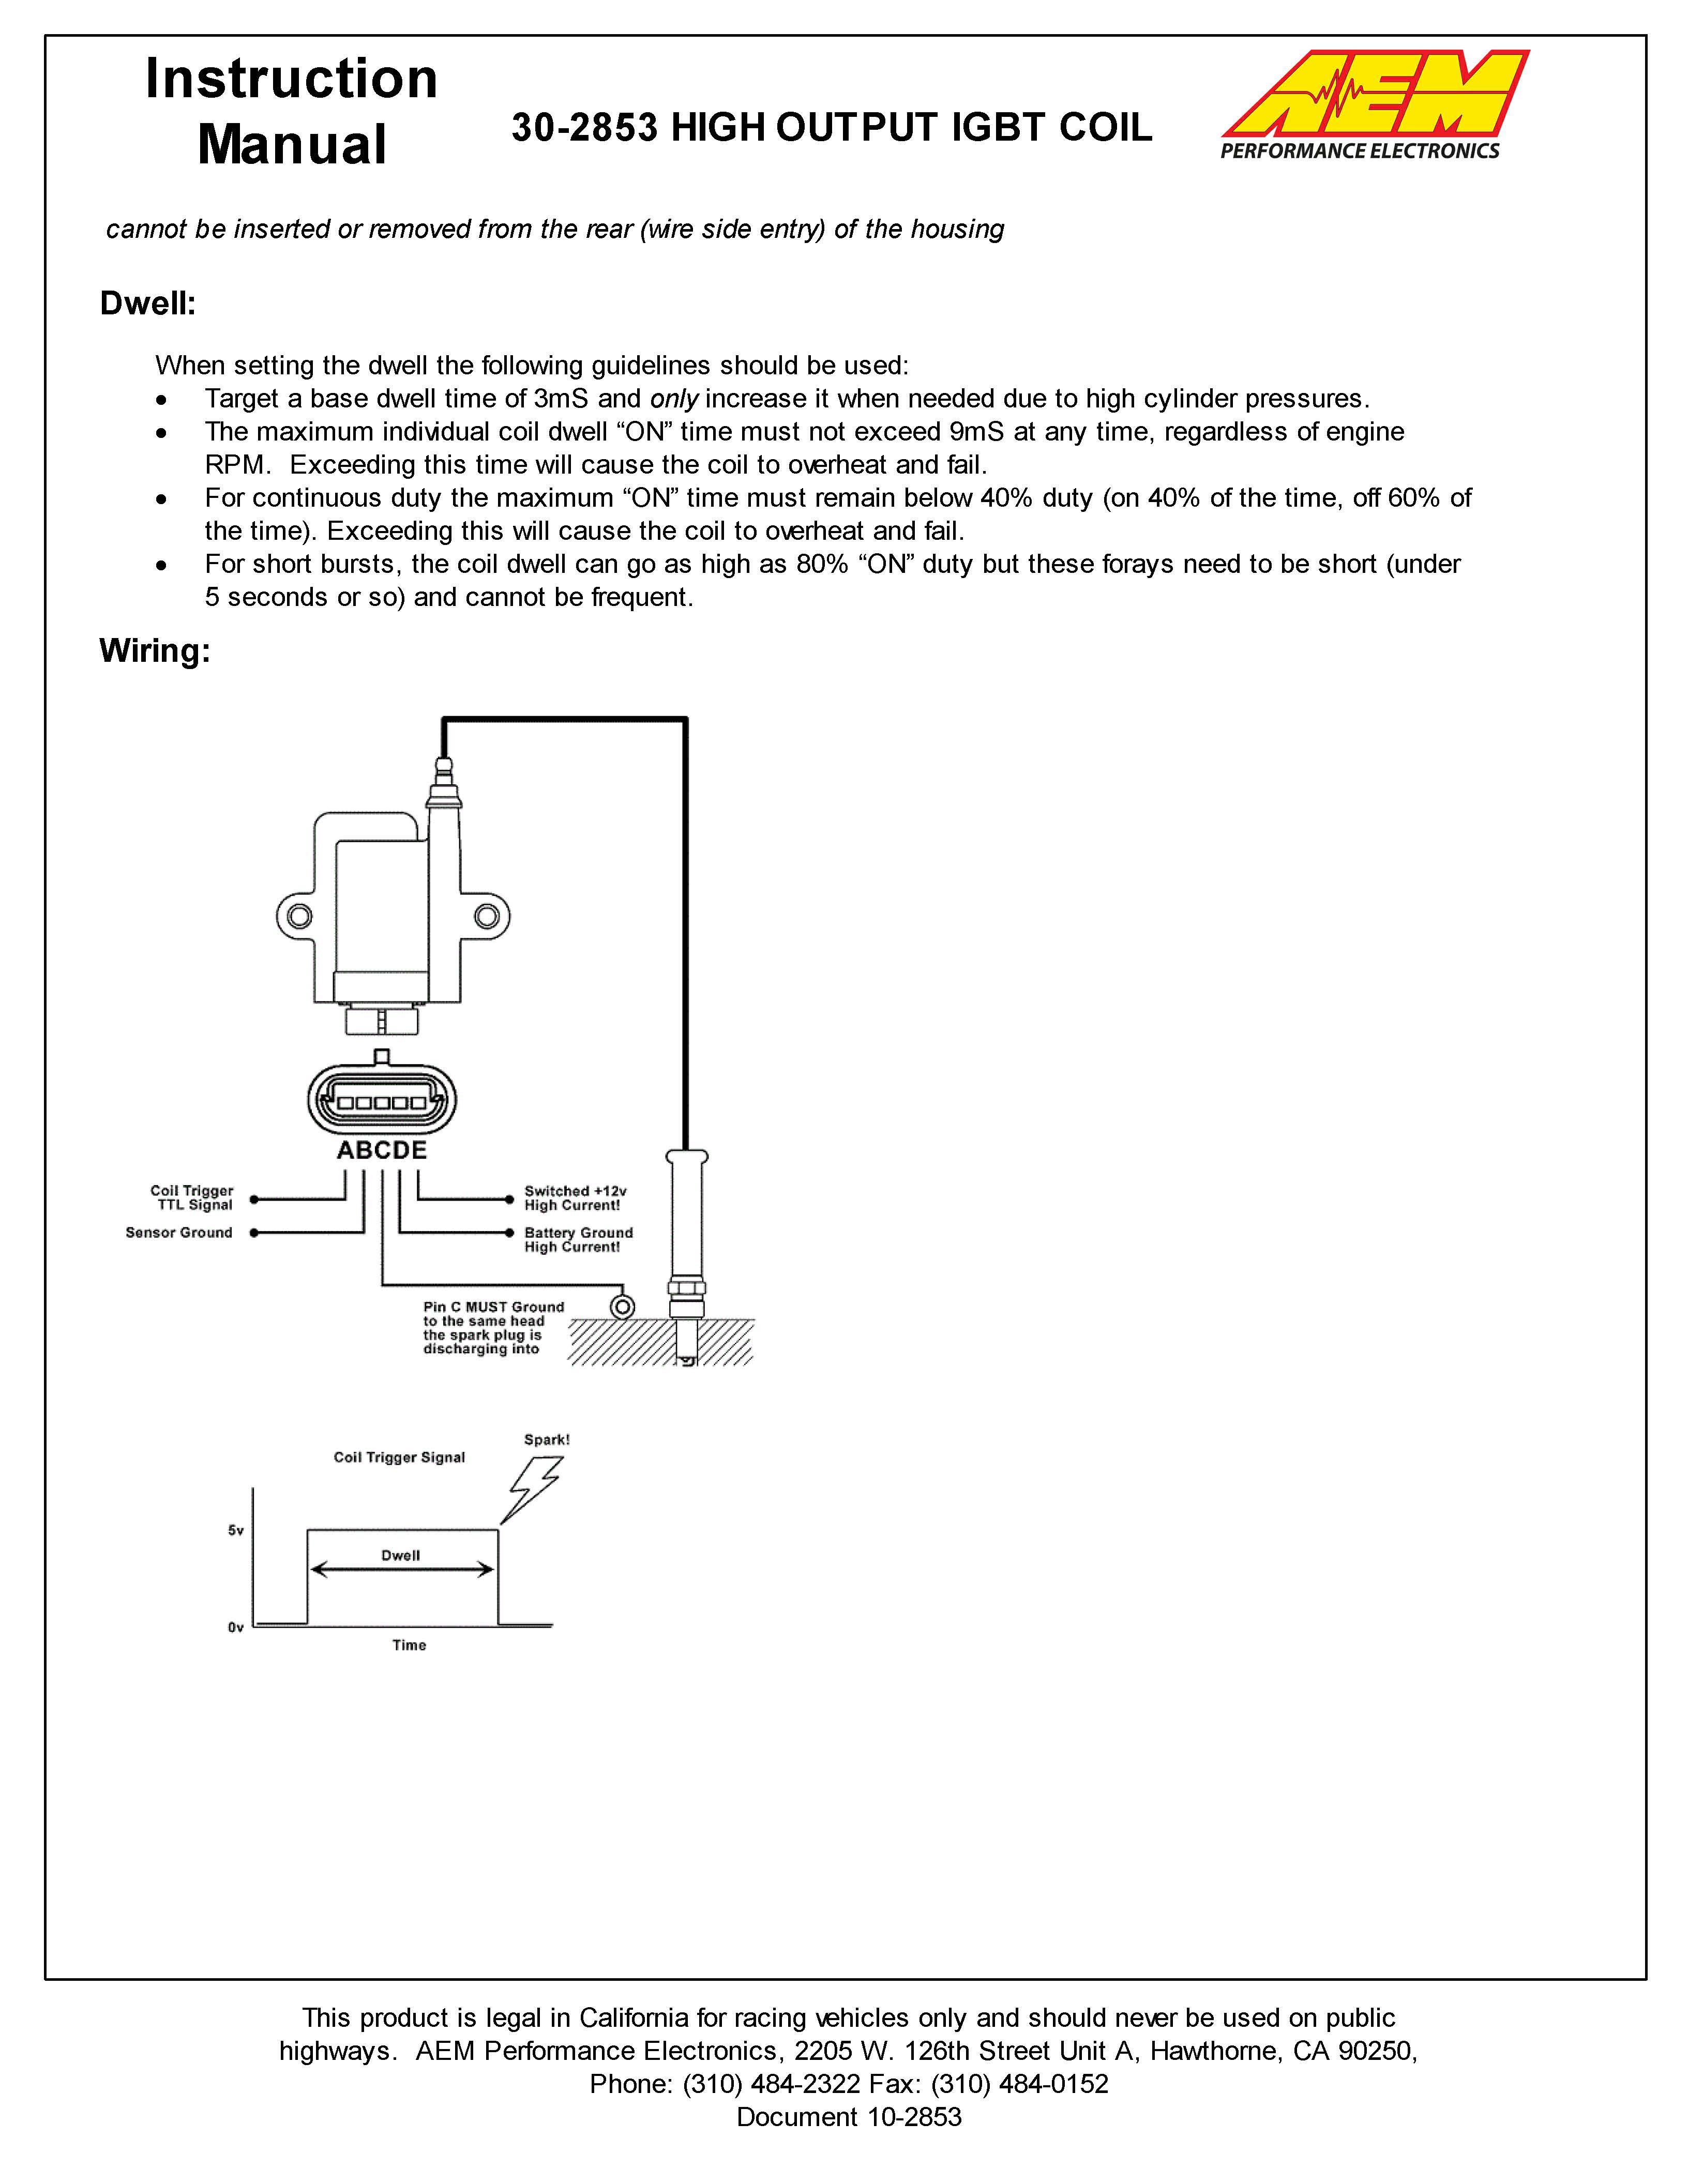 Aem Smart Coil Wiring Diagram - Dodge Throttle Position Sensor Wiring -  7ways.cukk.jeanjaures37.fr   Aem Smart Coil Wiring Diagram      Wiring Diagram Resource